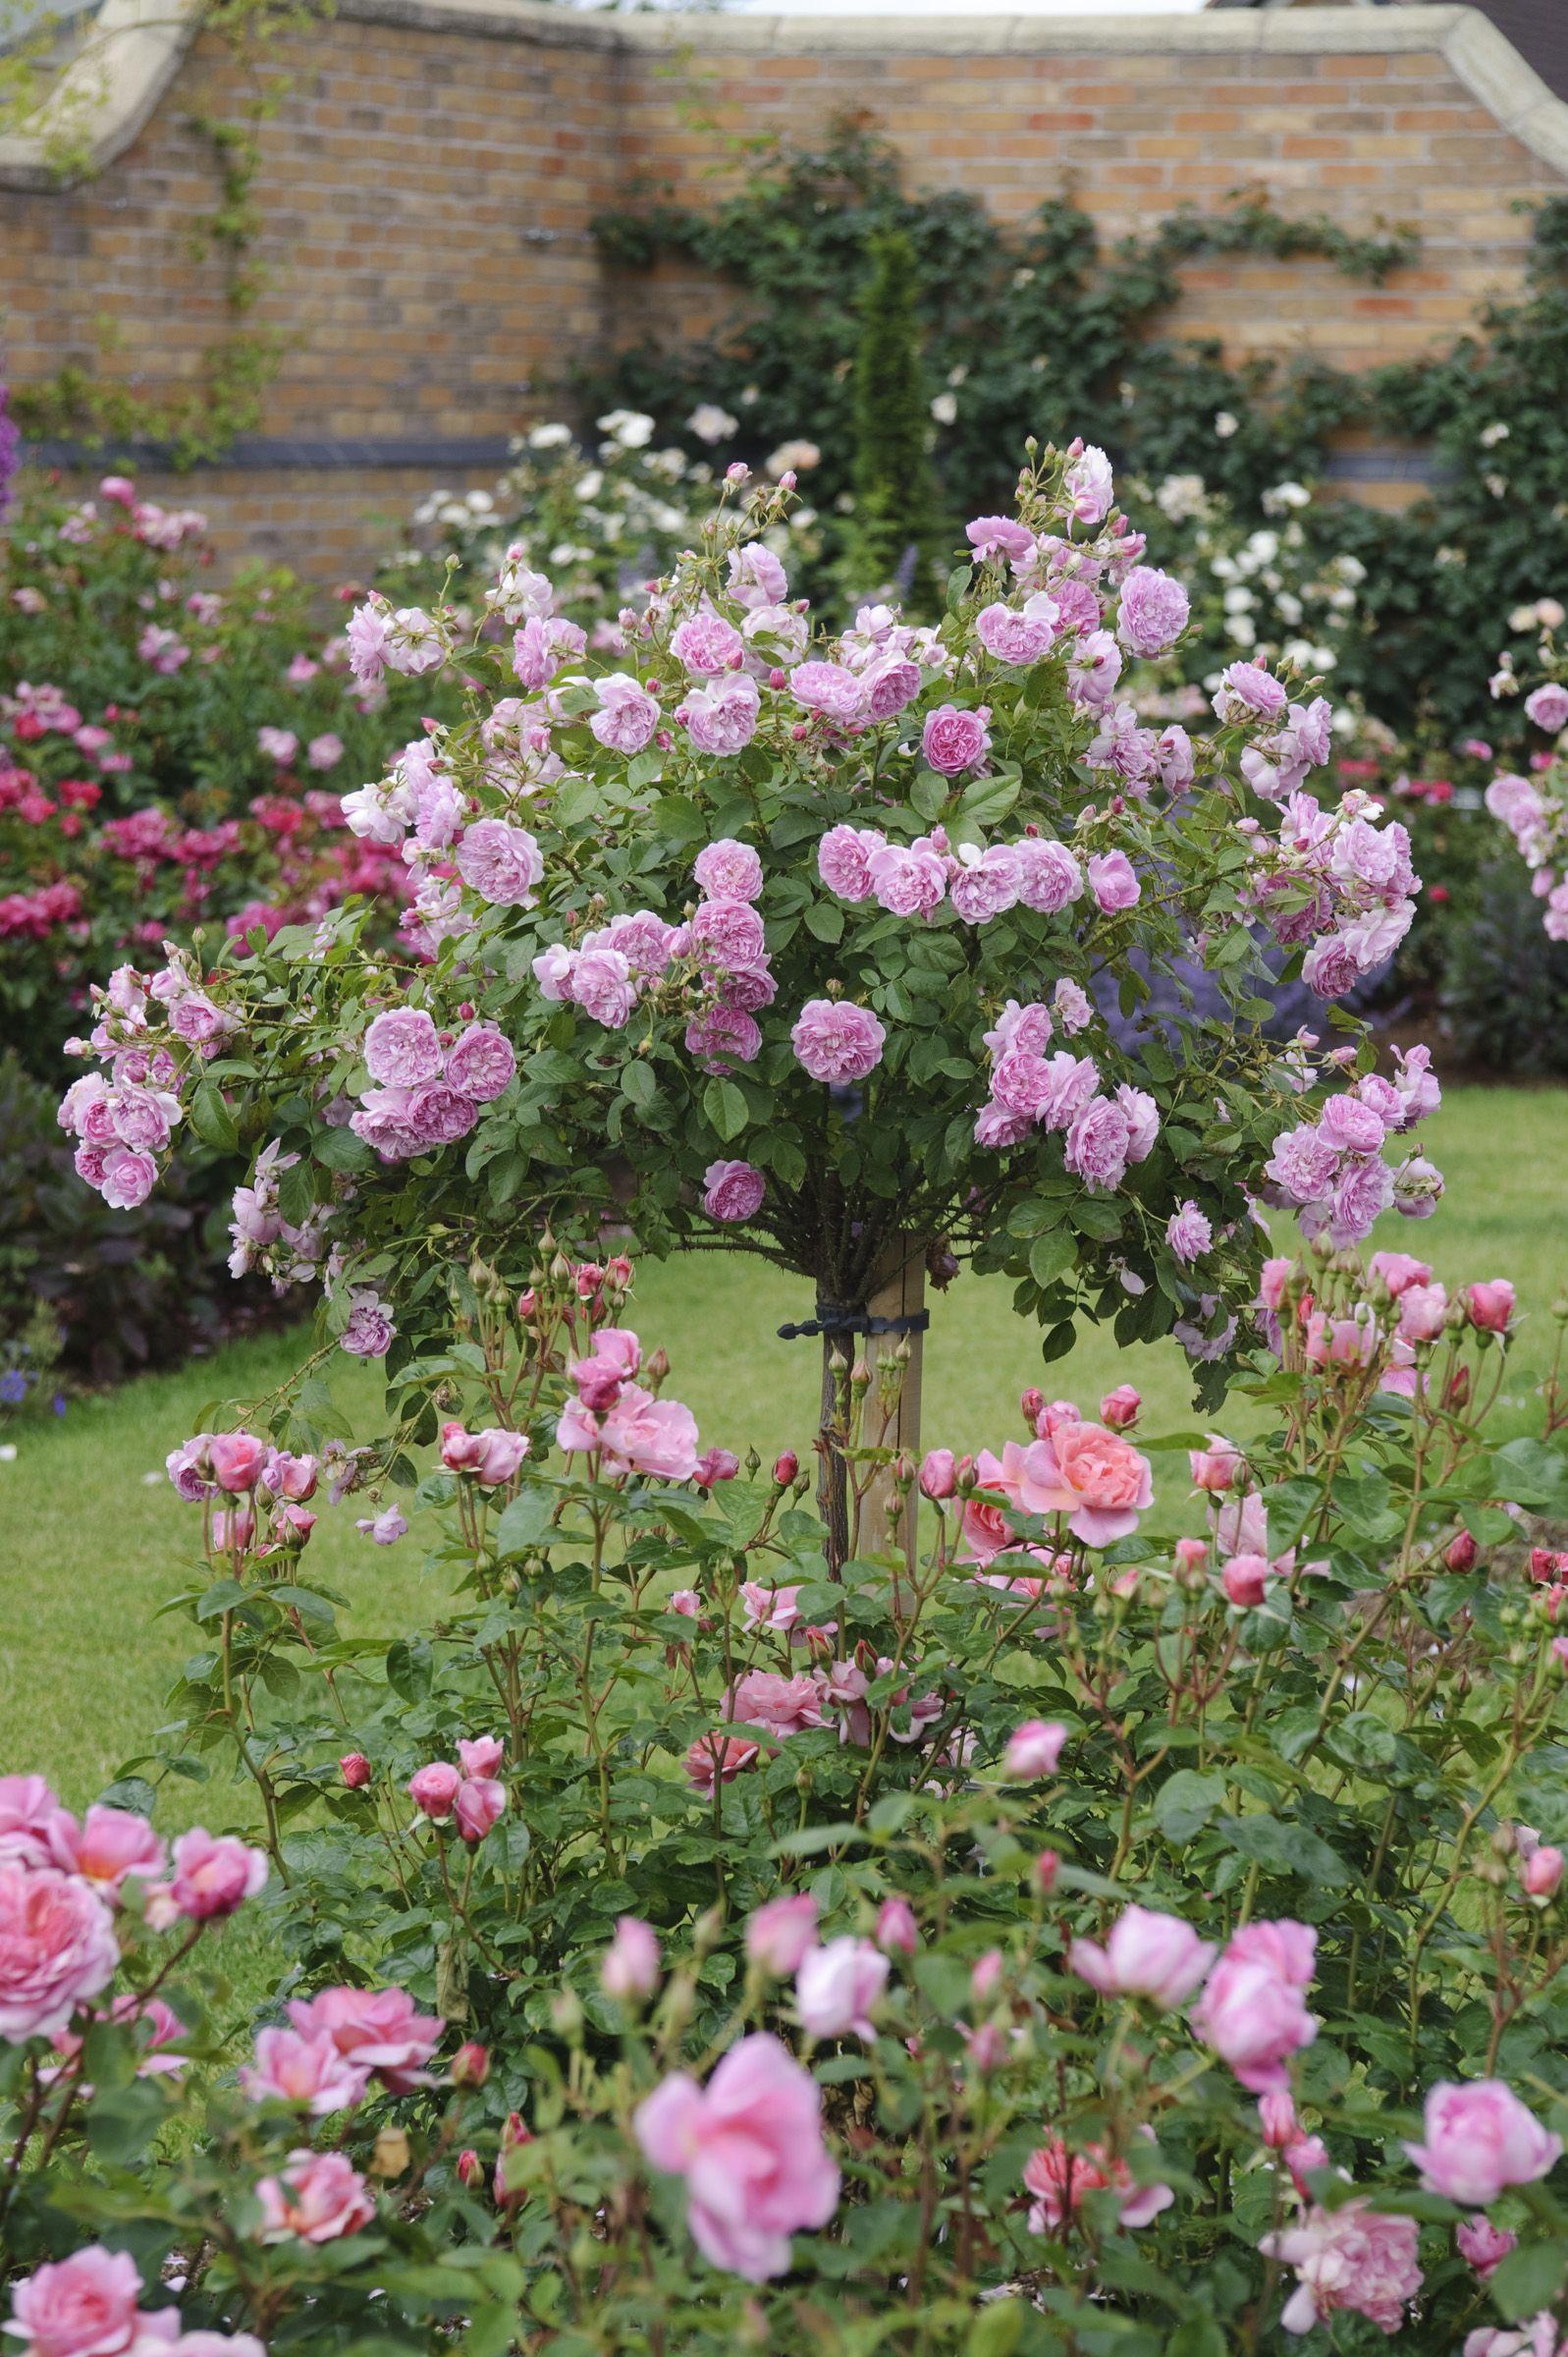 Harlow Carr Standard Rose Garden Design Rose Garden Garden